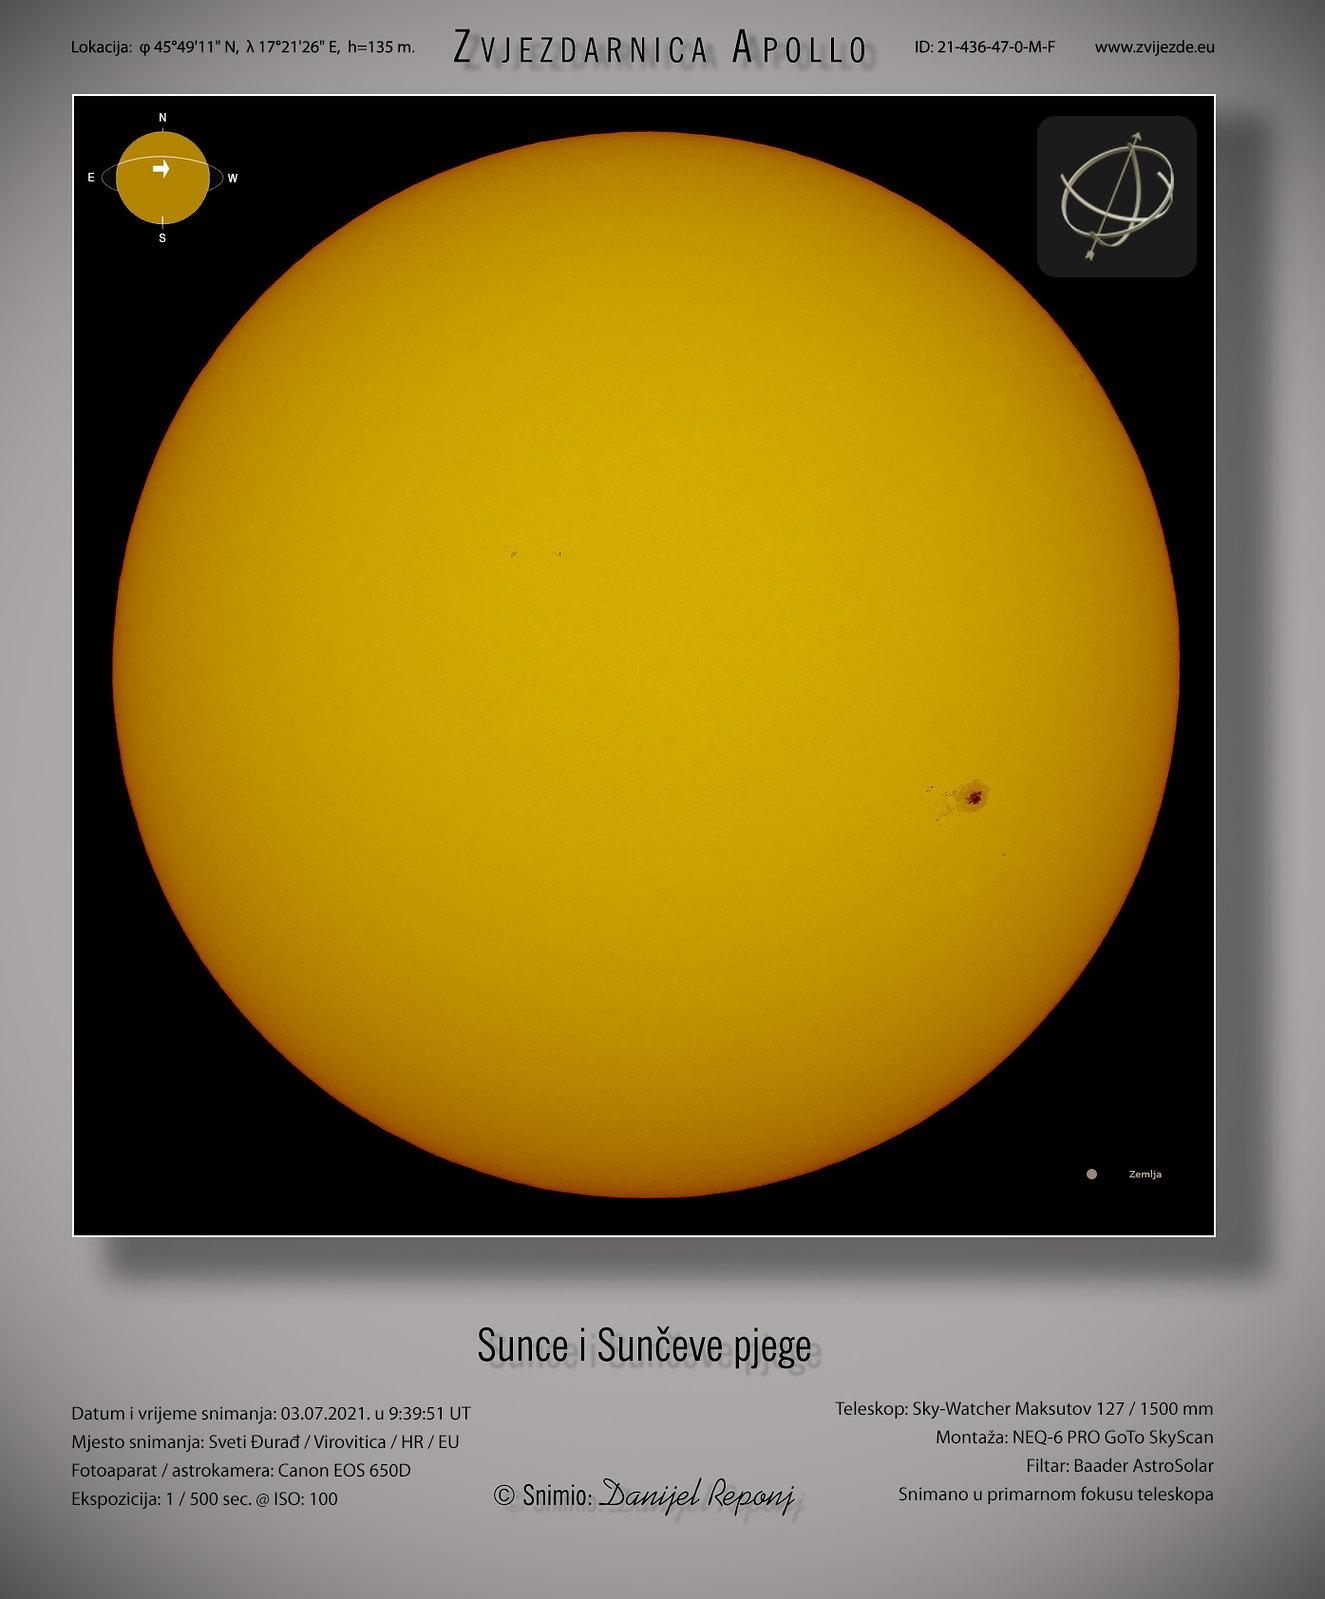 Sunce i pjege, 0.7.2021.